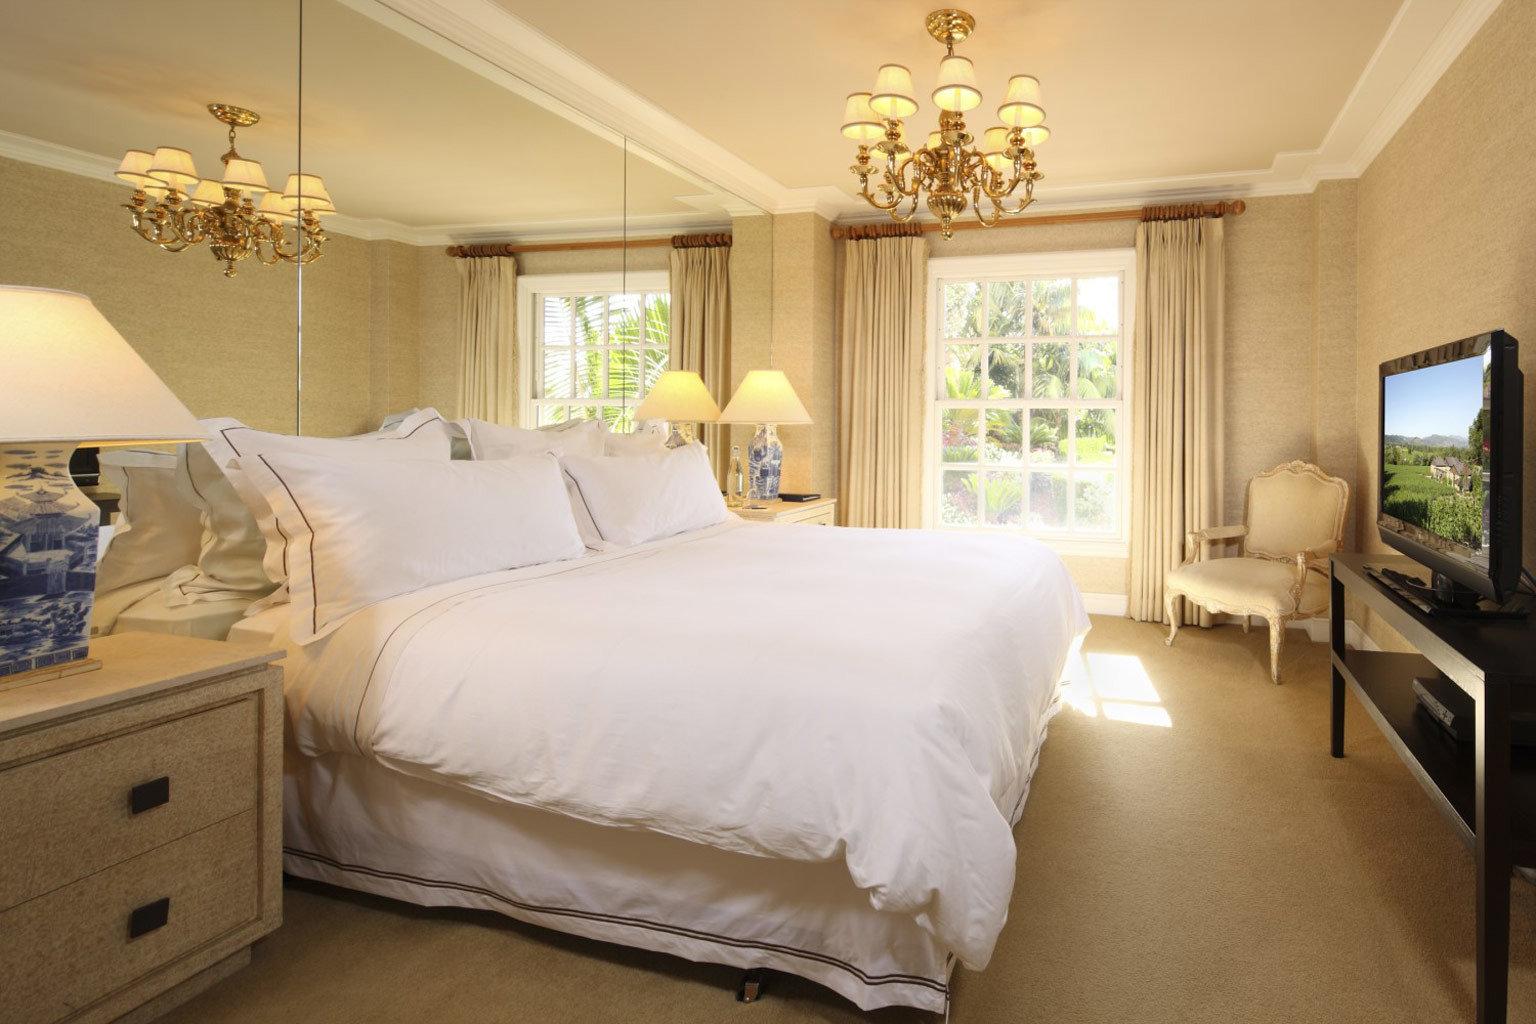 Bedroom Elegant Luxury Scenic views property Suite scene cottage home bed sheet living room